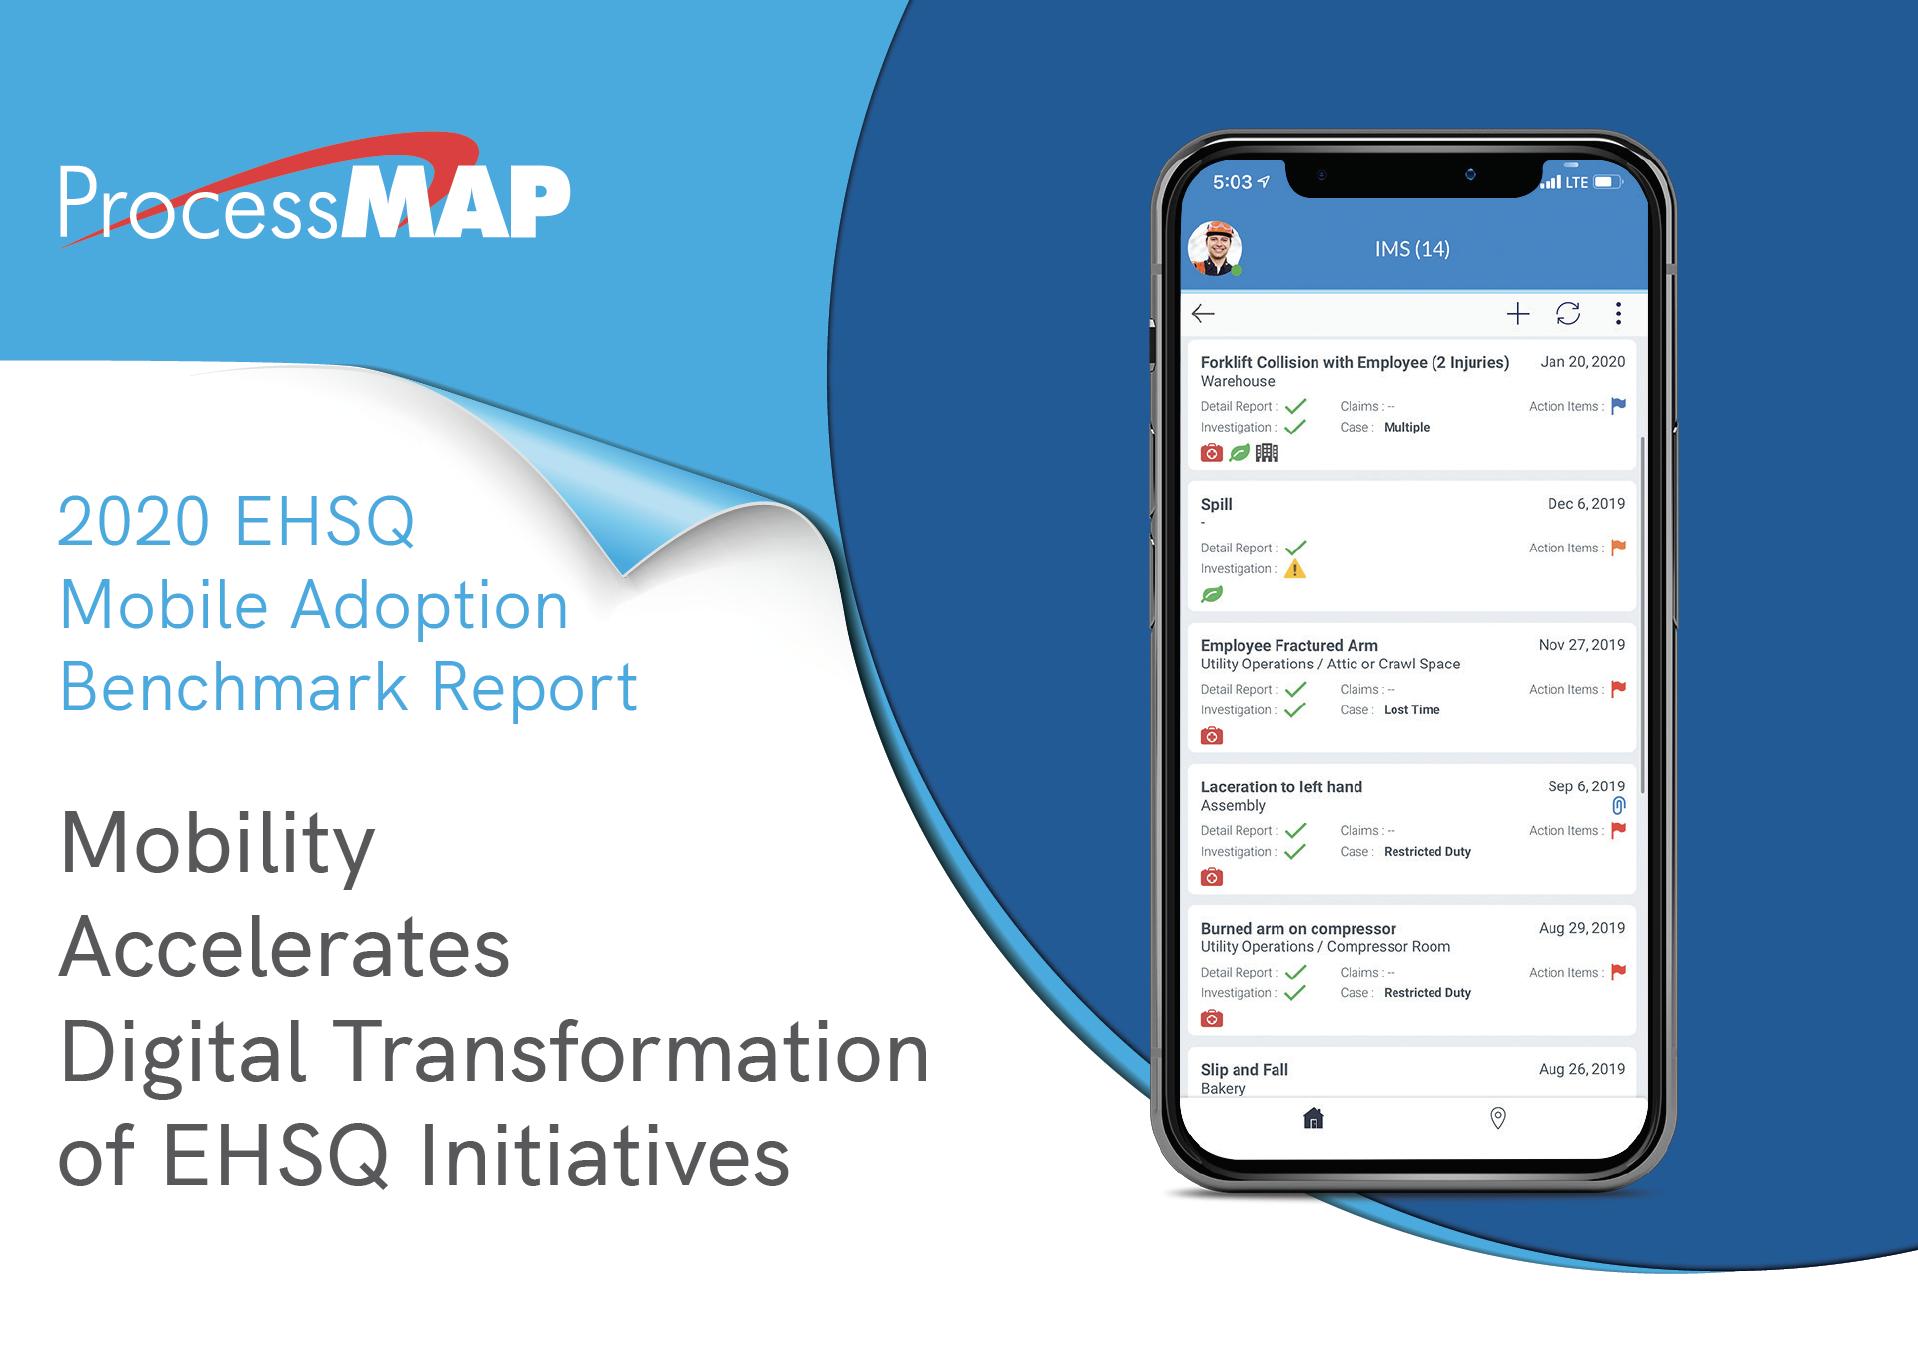 ProcessMAP 2020 ESHQ Mobile Adoption Benchmark Report